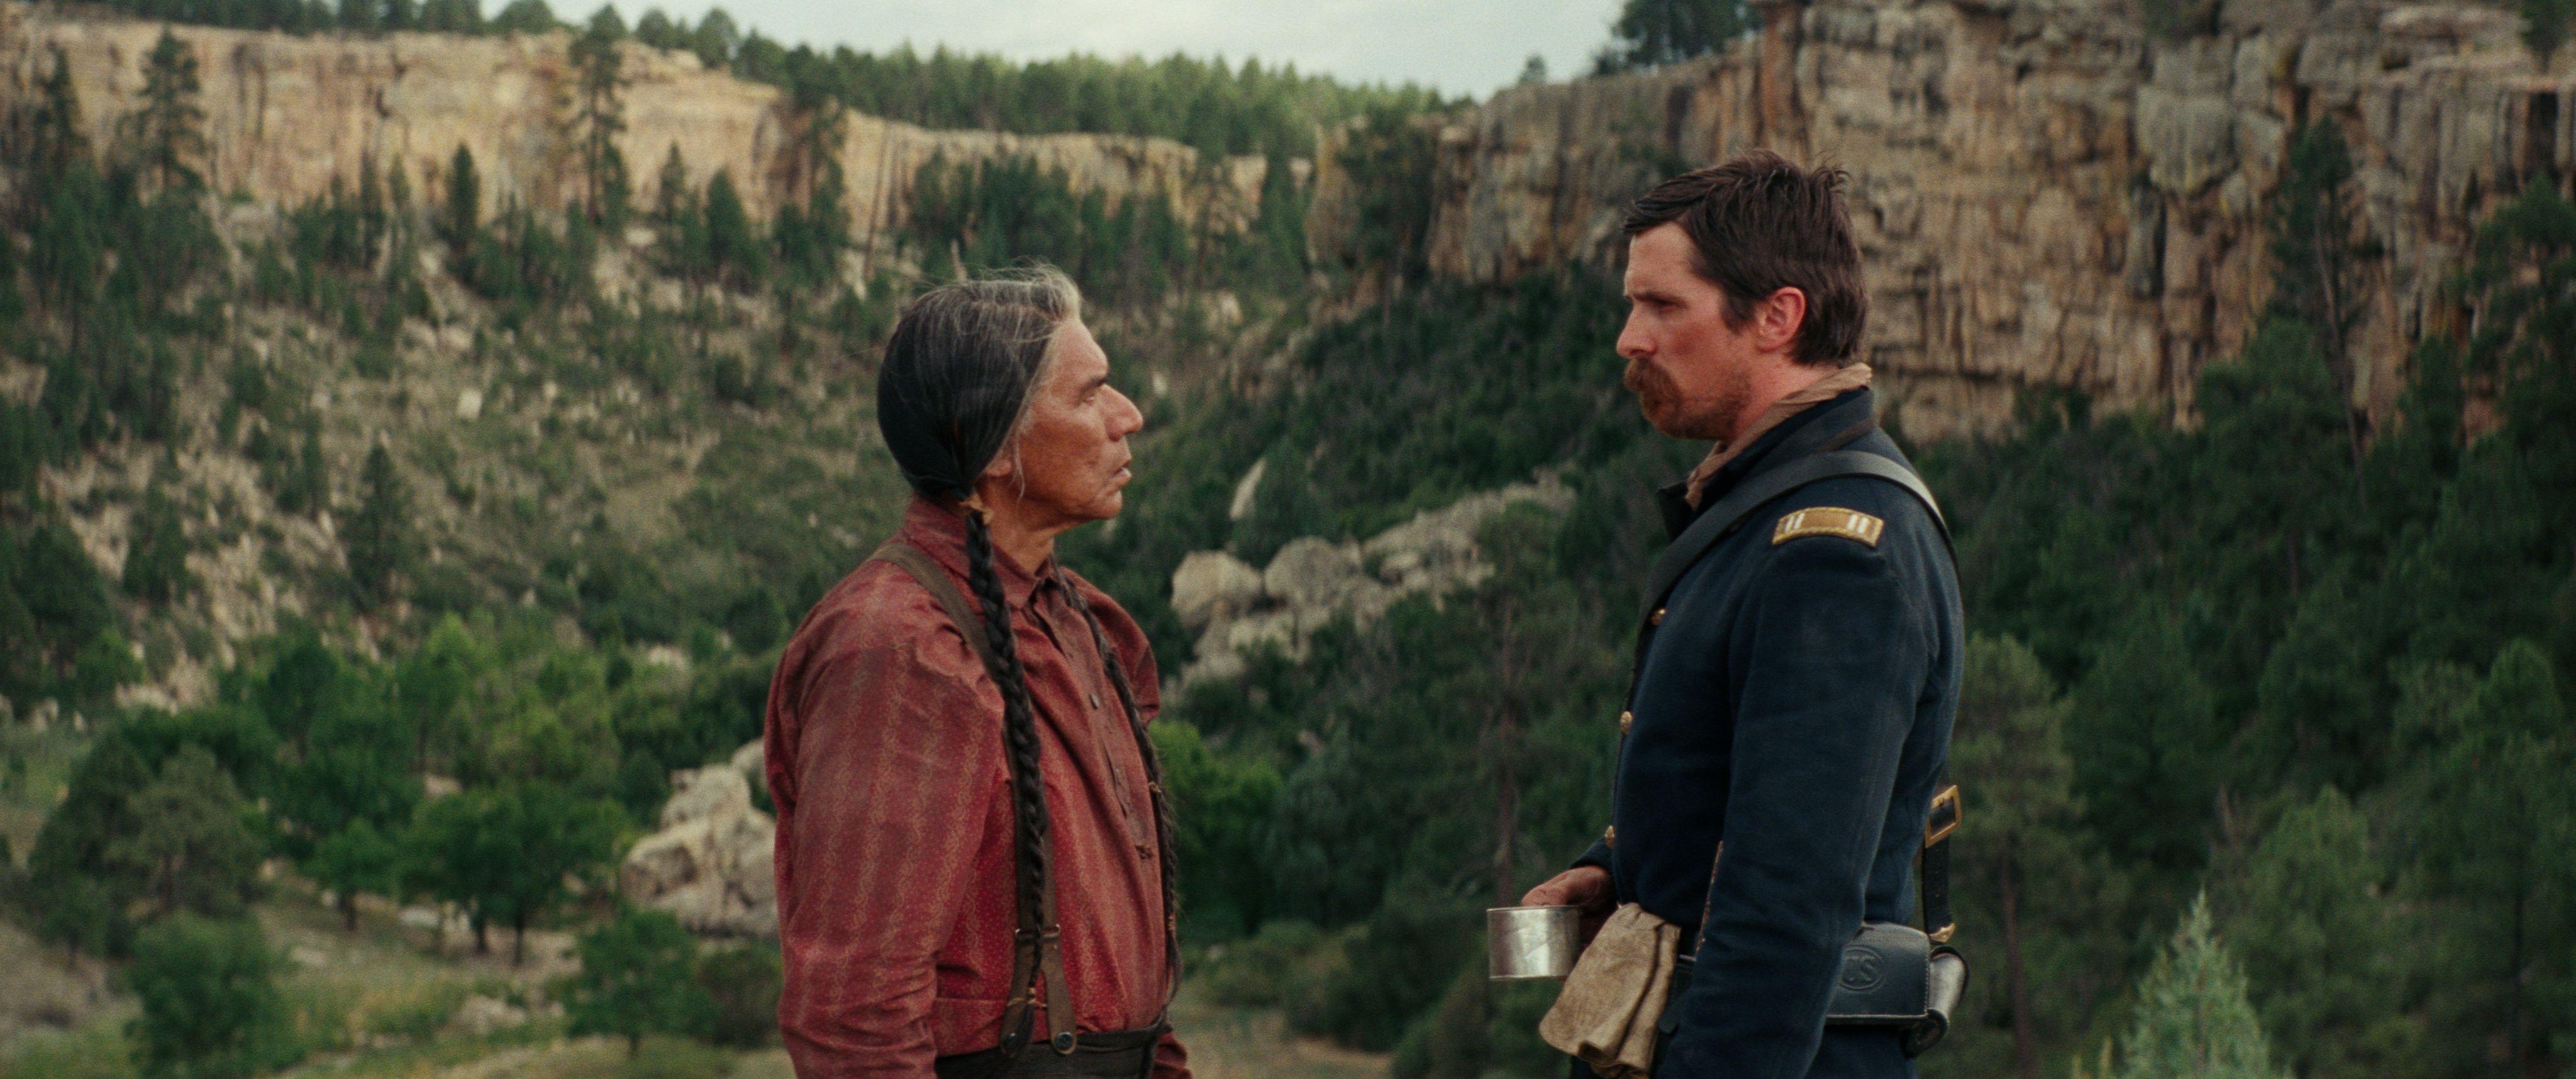 Christian Bale und Wes Studi in Hostiles - Feinde